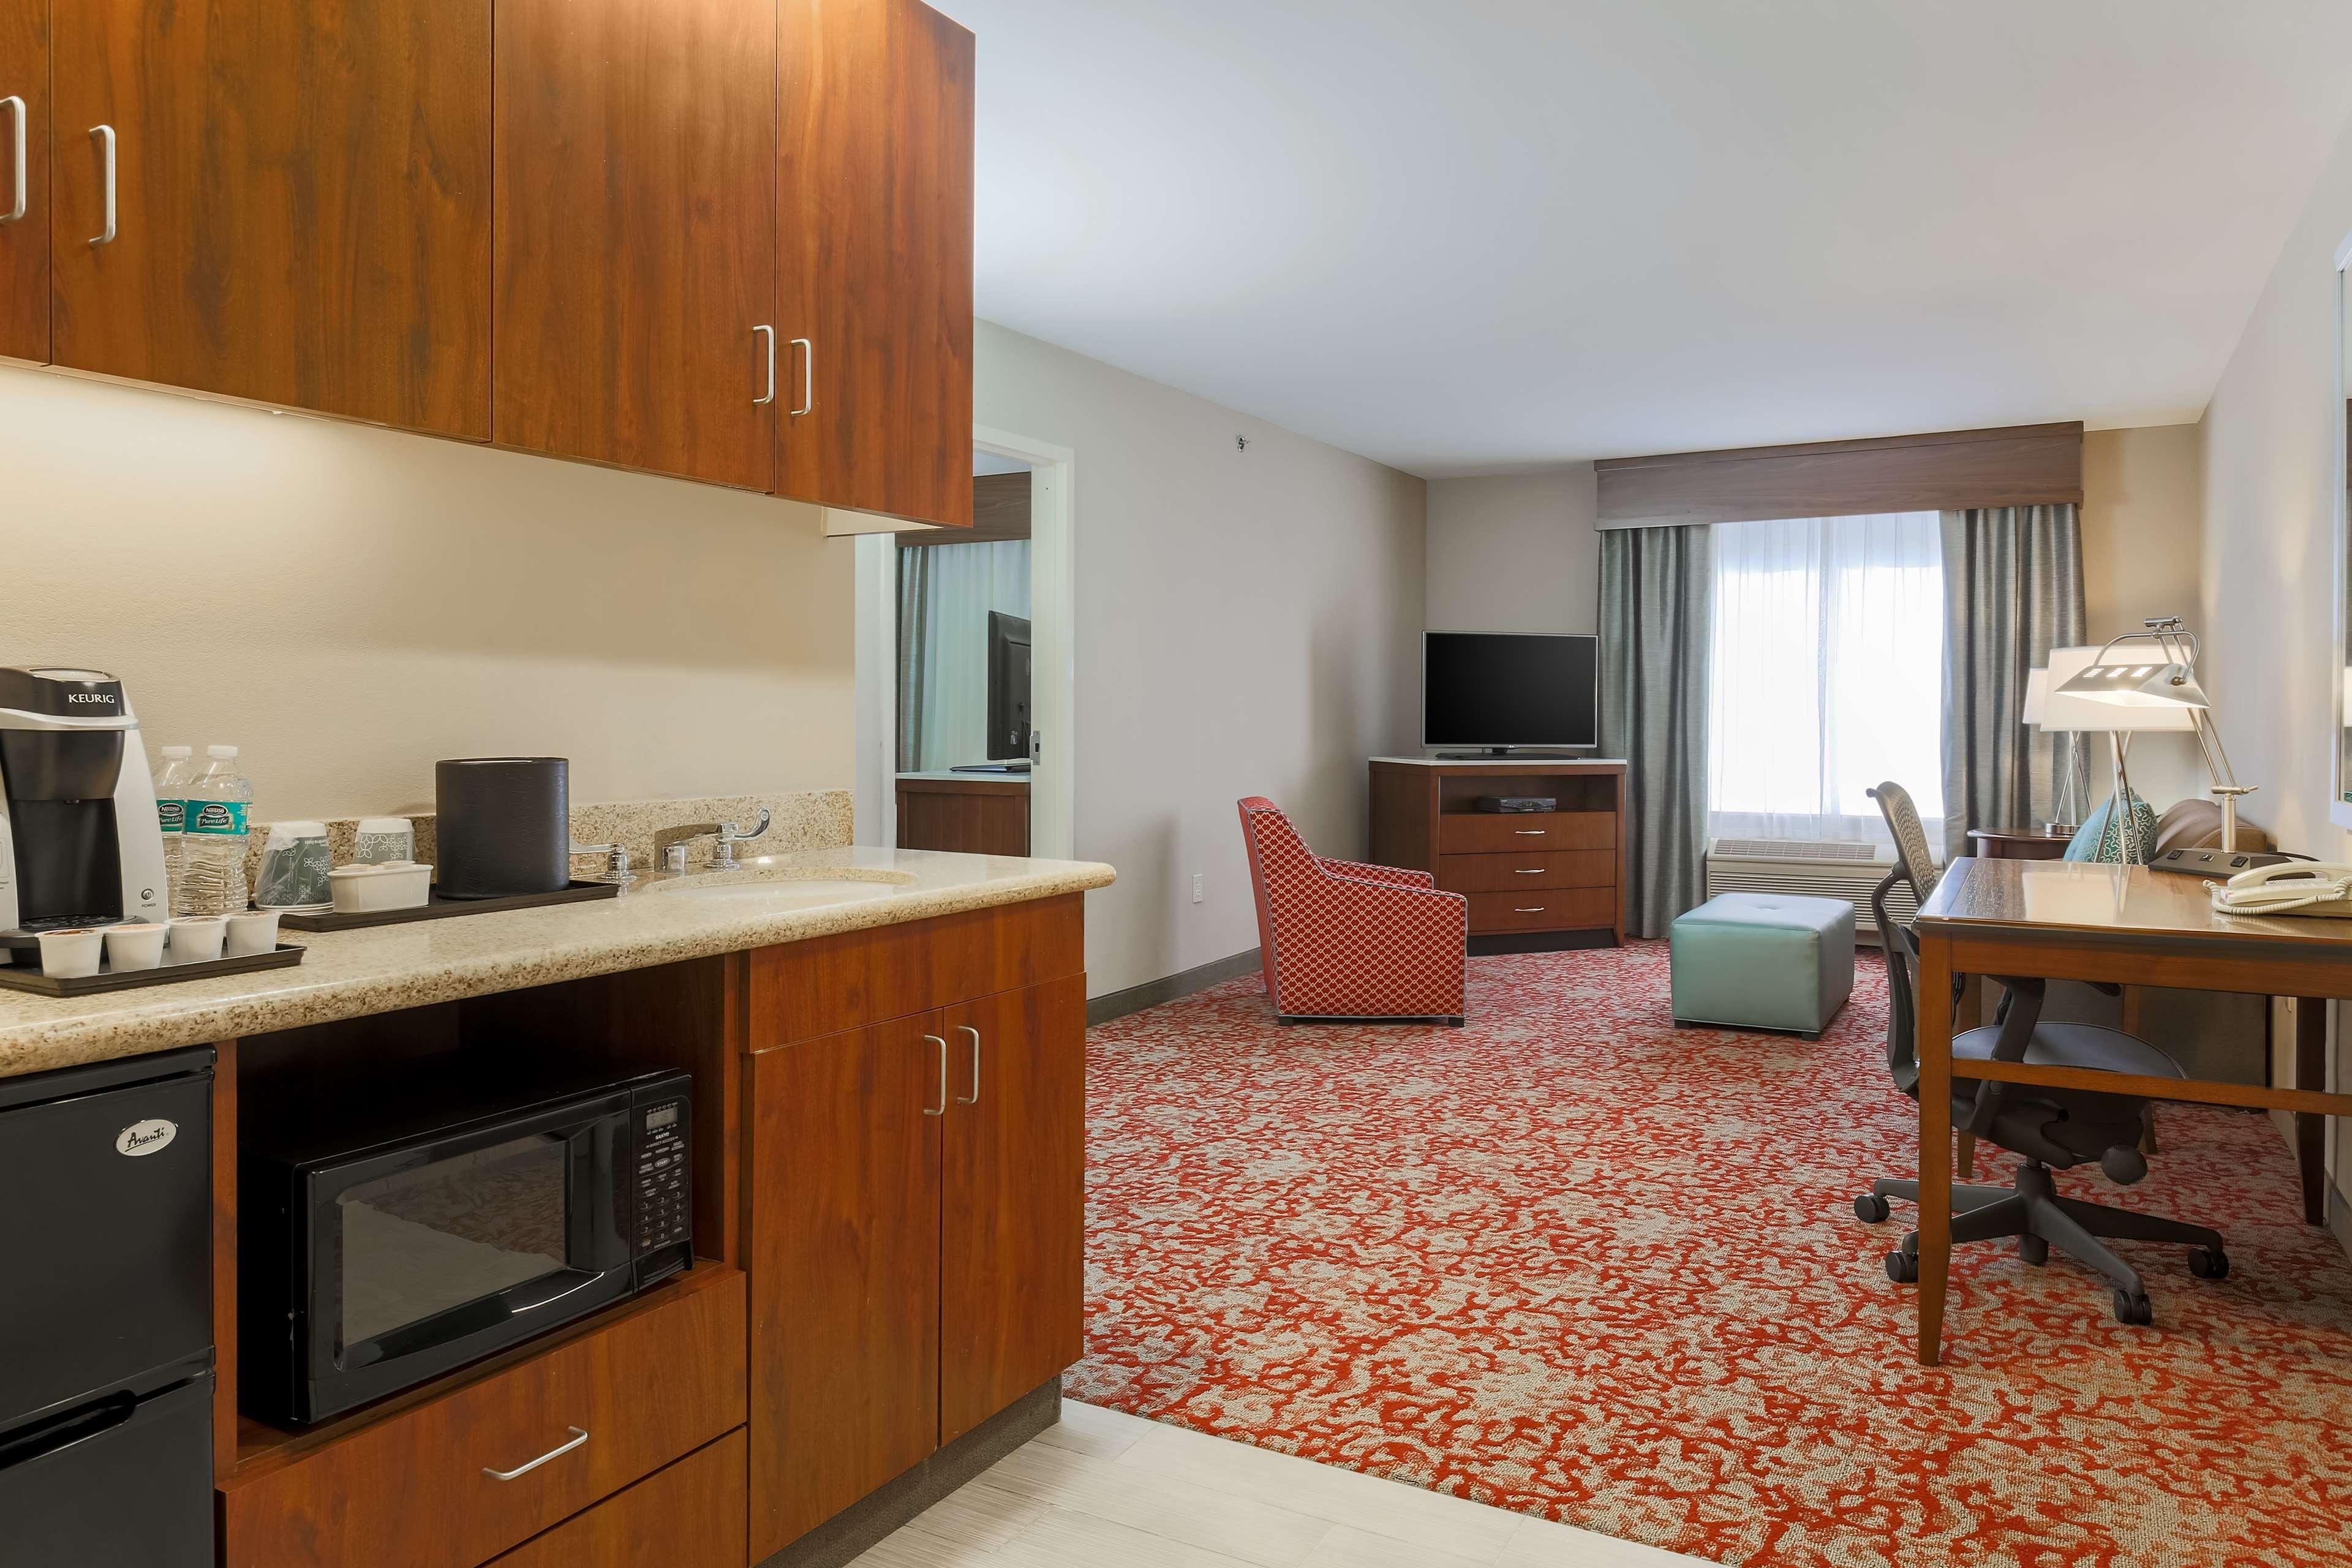 Hilton Garden Inn Nanuet image 22